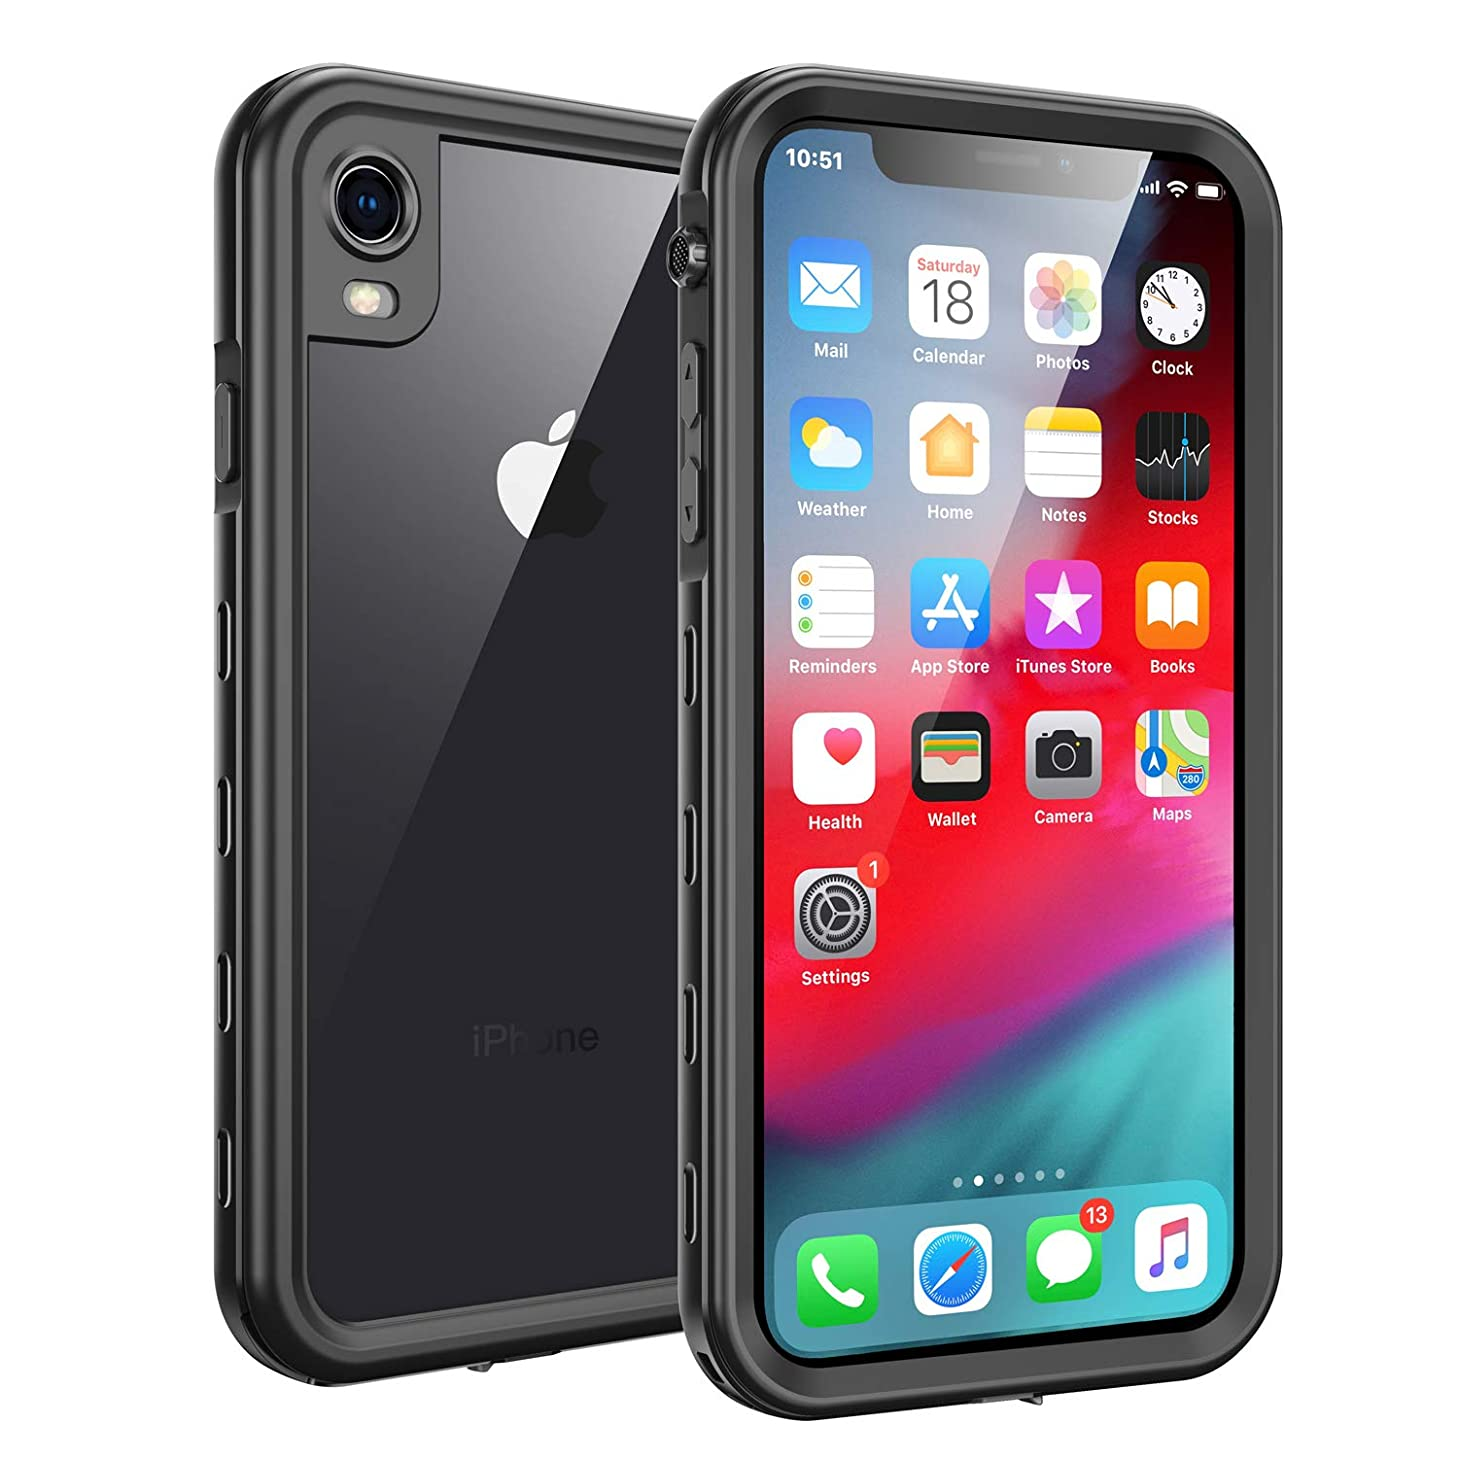 iPhone XR Waterproof Case, Fansteck IP68 Waterproof/Snowproof/Shockproof/Dirtproof, Full-Body Protective Case with Built-in Screen Protector (6.1-inch) (Black)